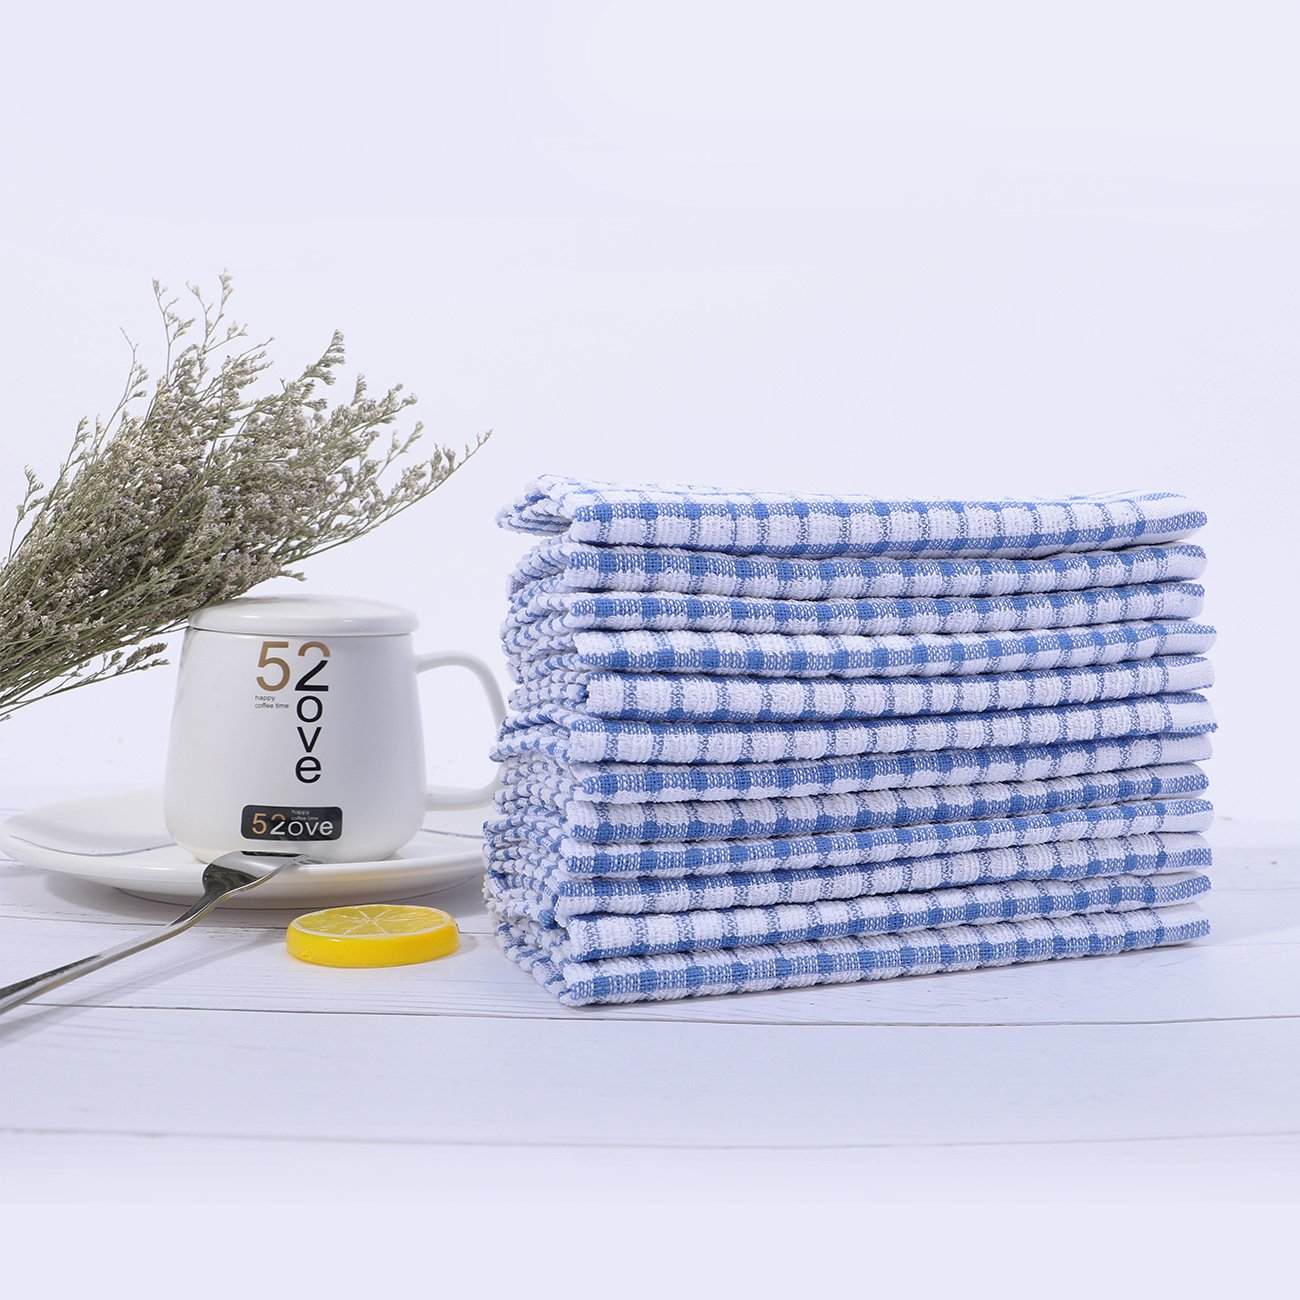 Kitchen Towels Bulk: Kitchen Towels Bulk 100% Cotton Kitchen Dish-Cloths